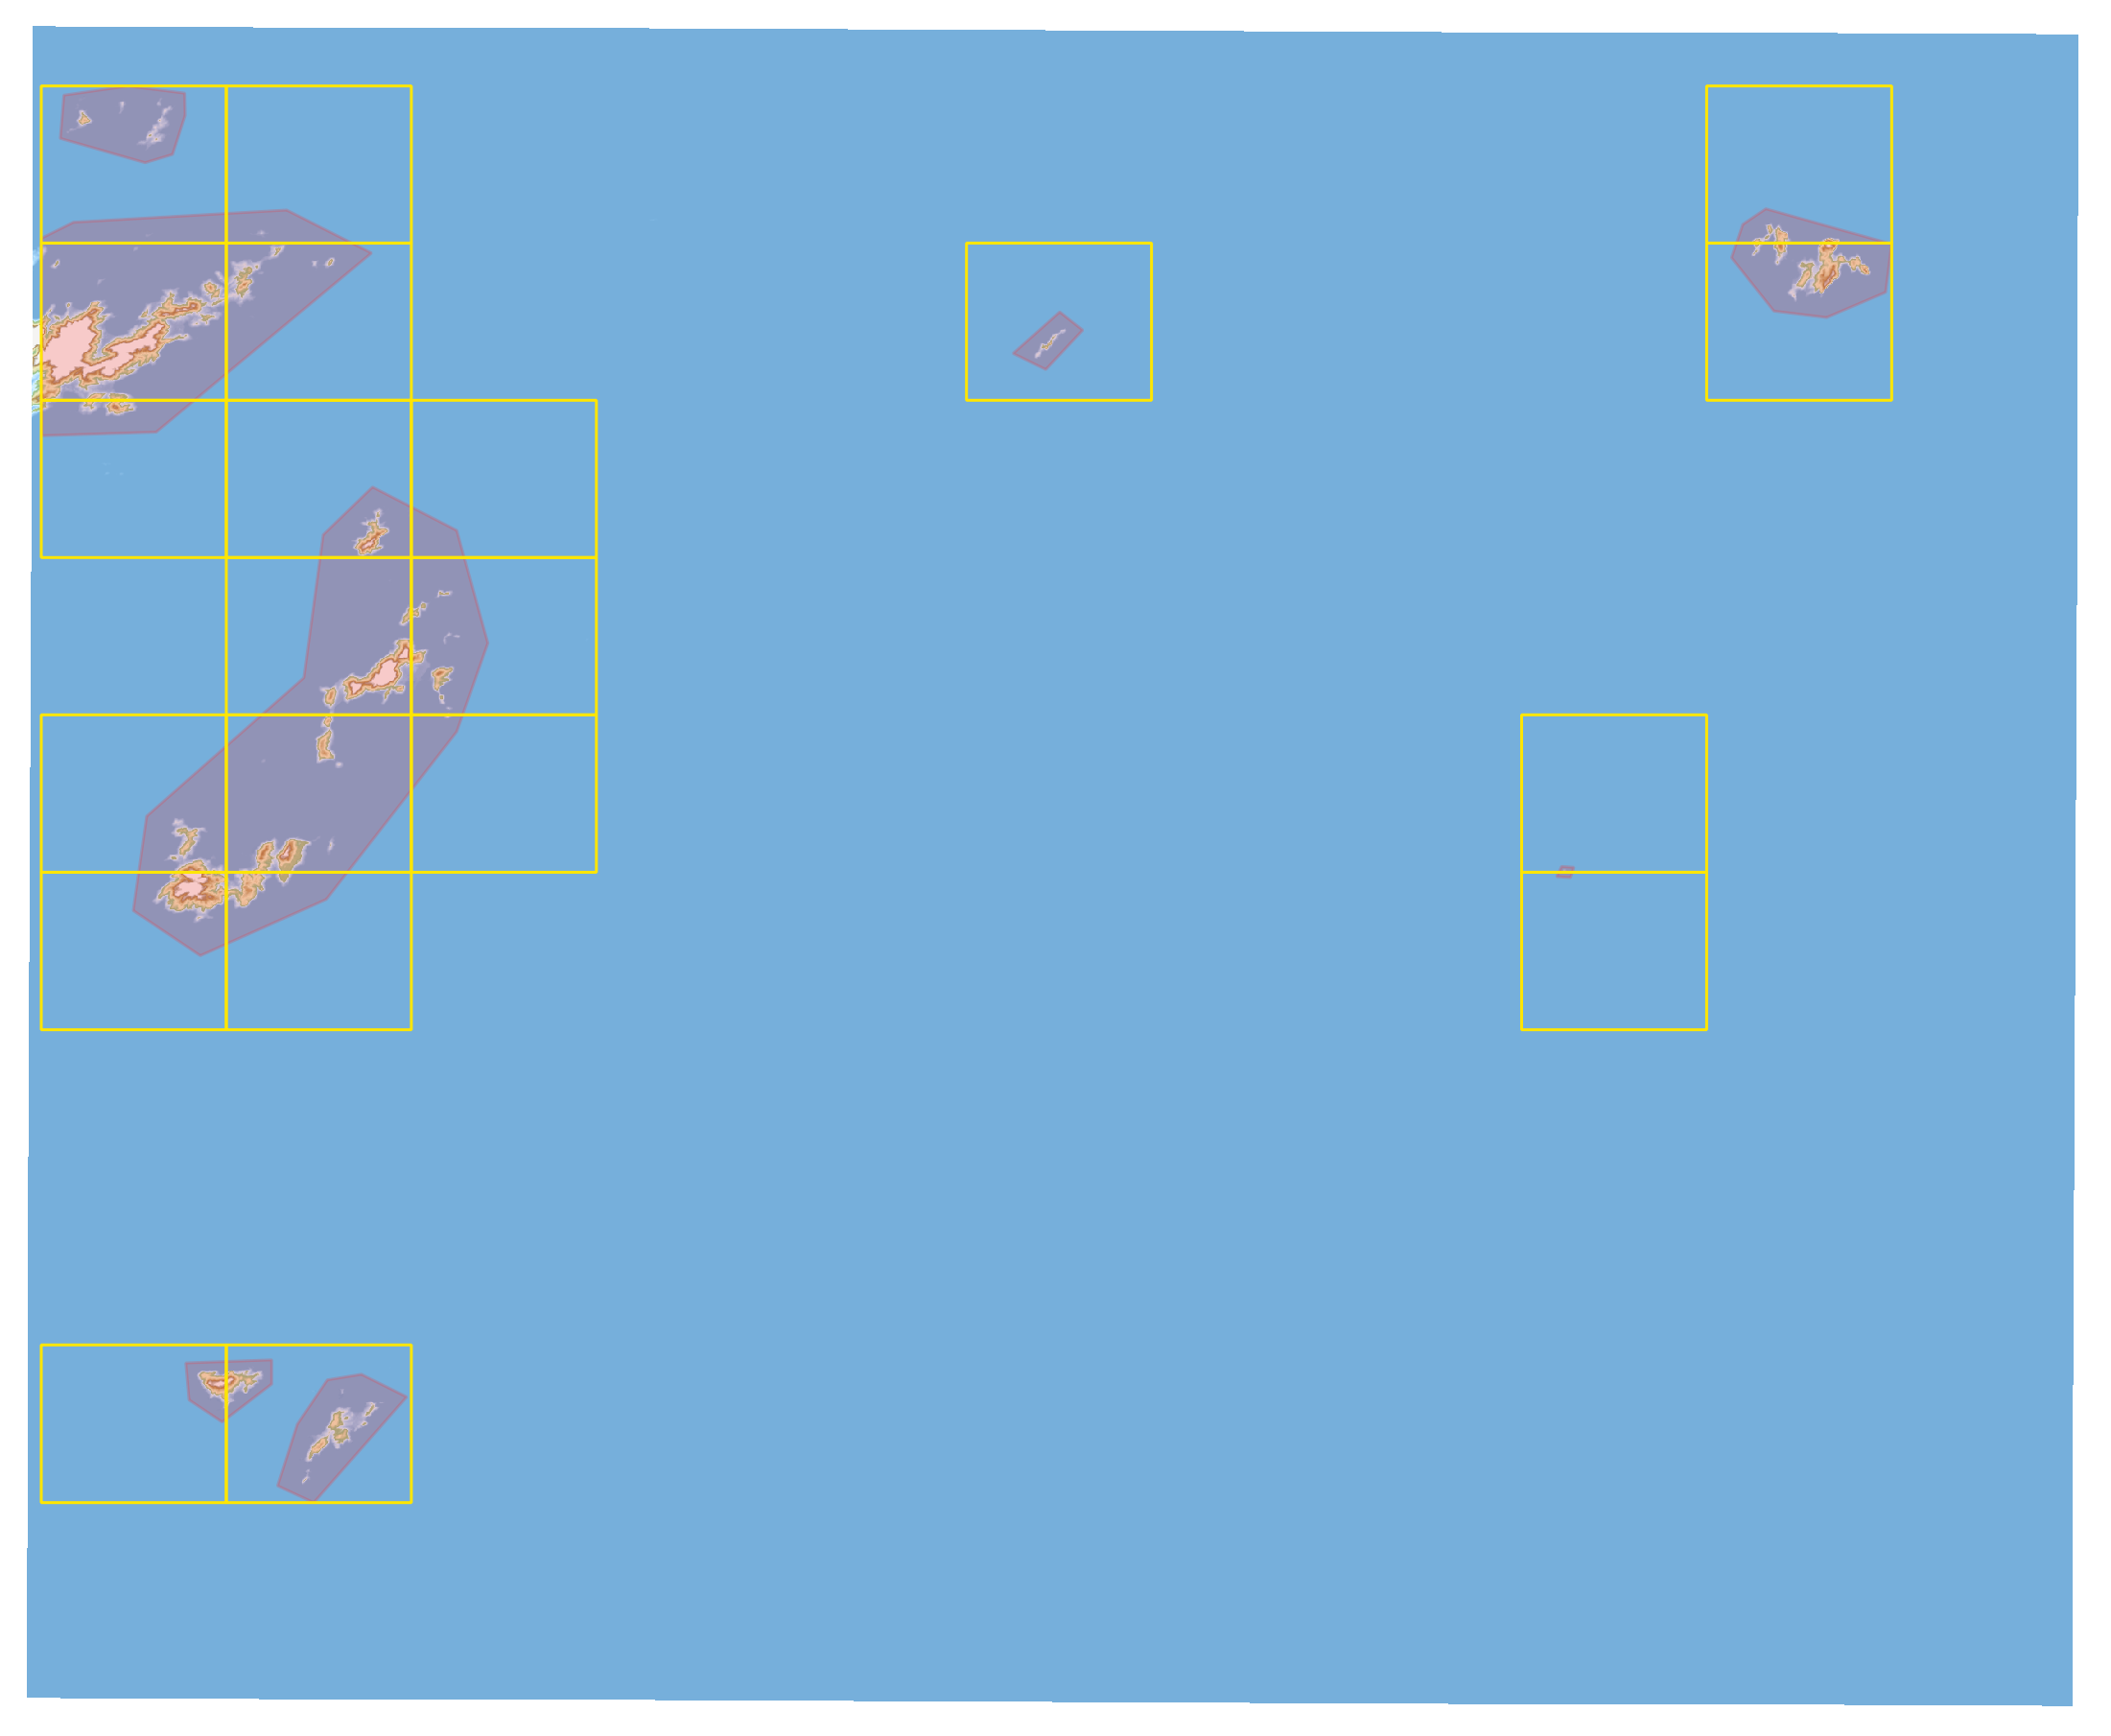 map_border.png